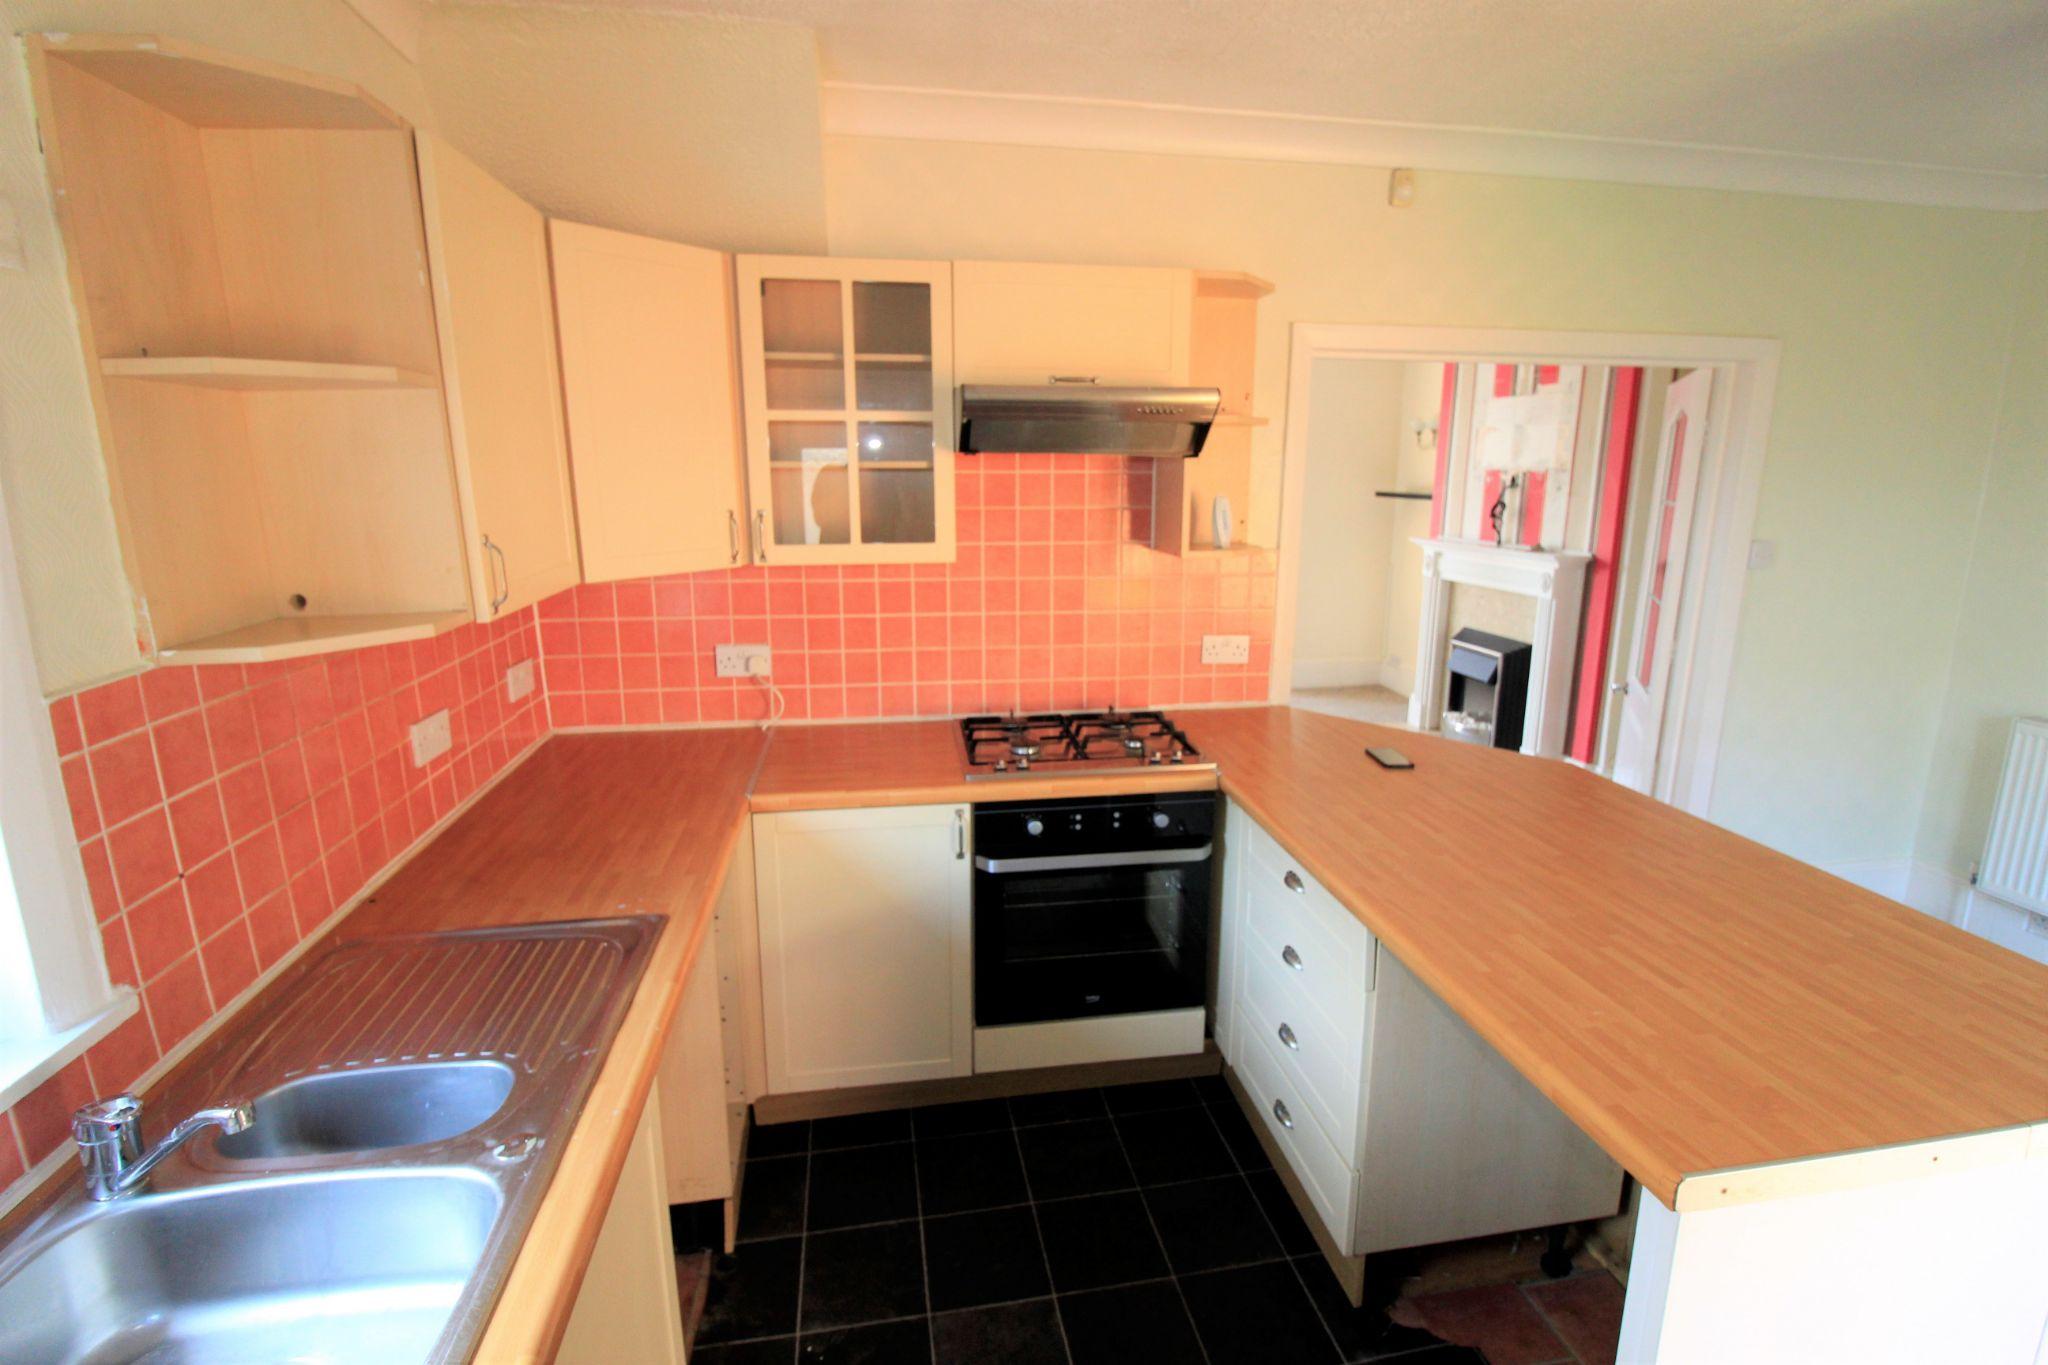 2 bedroom semi-detached house Let in Bradford - Kitchen